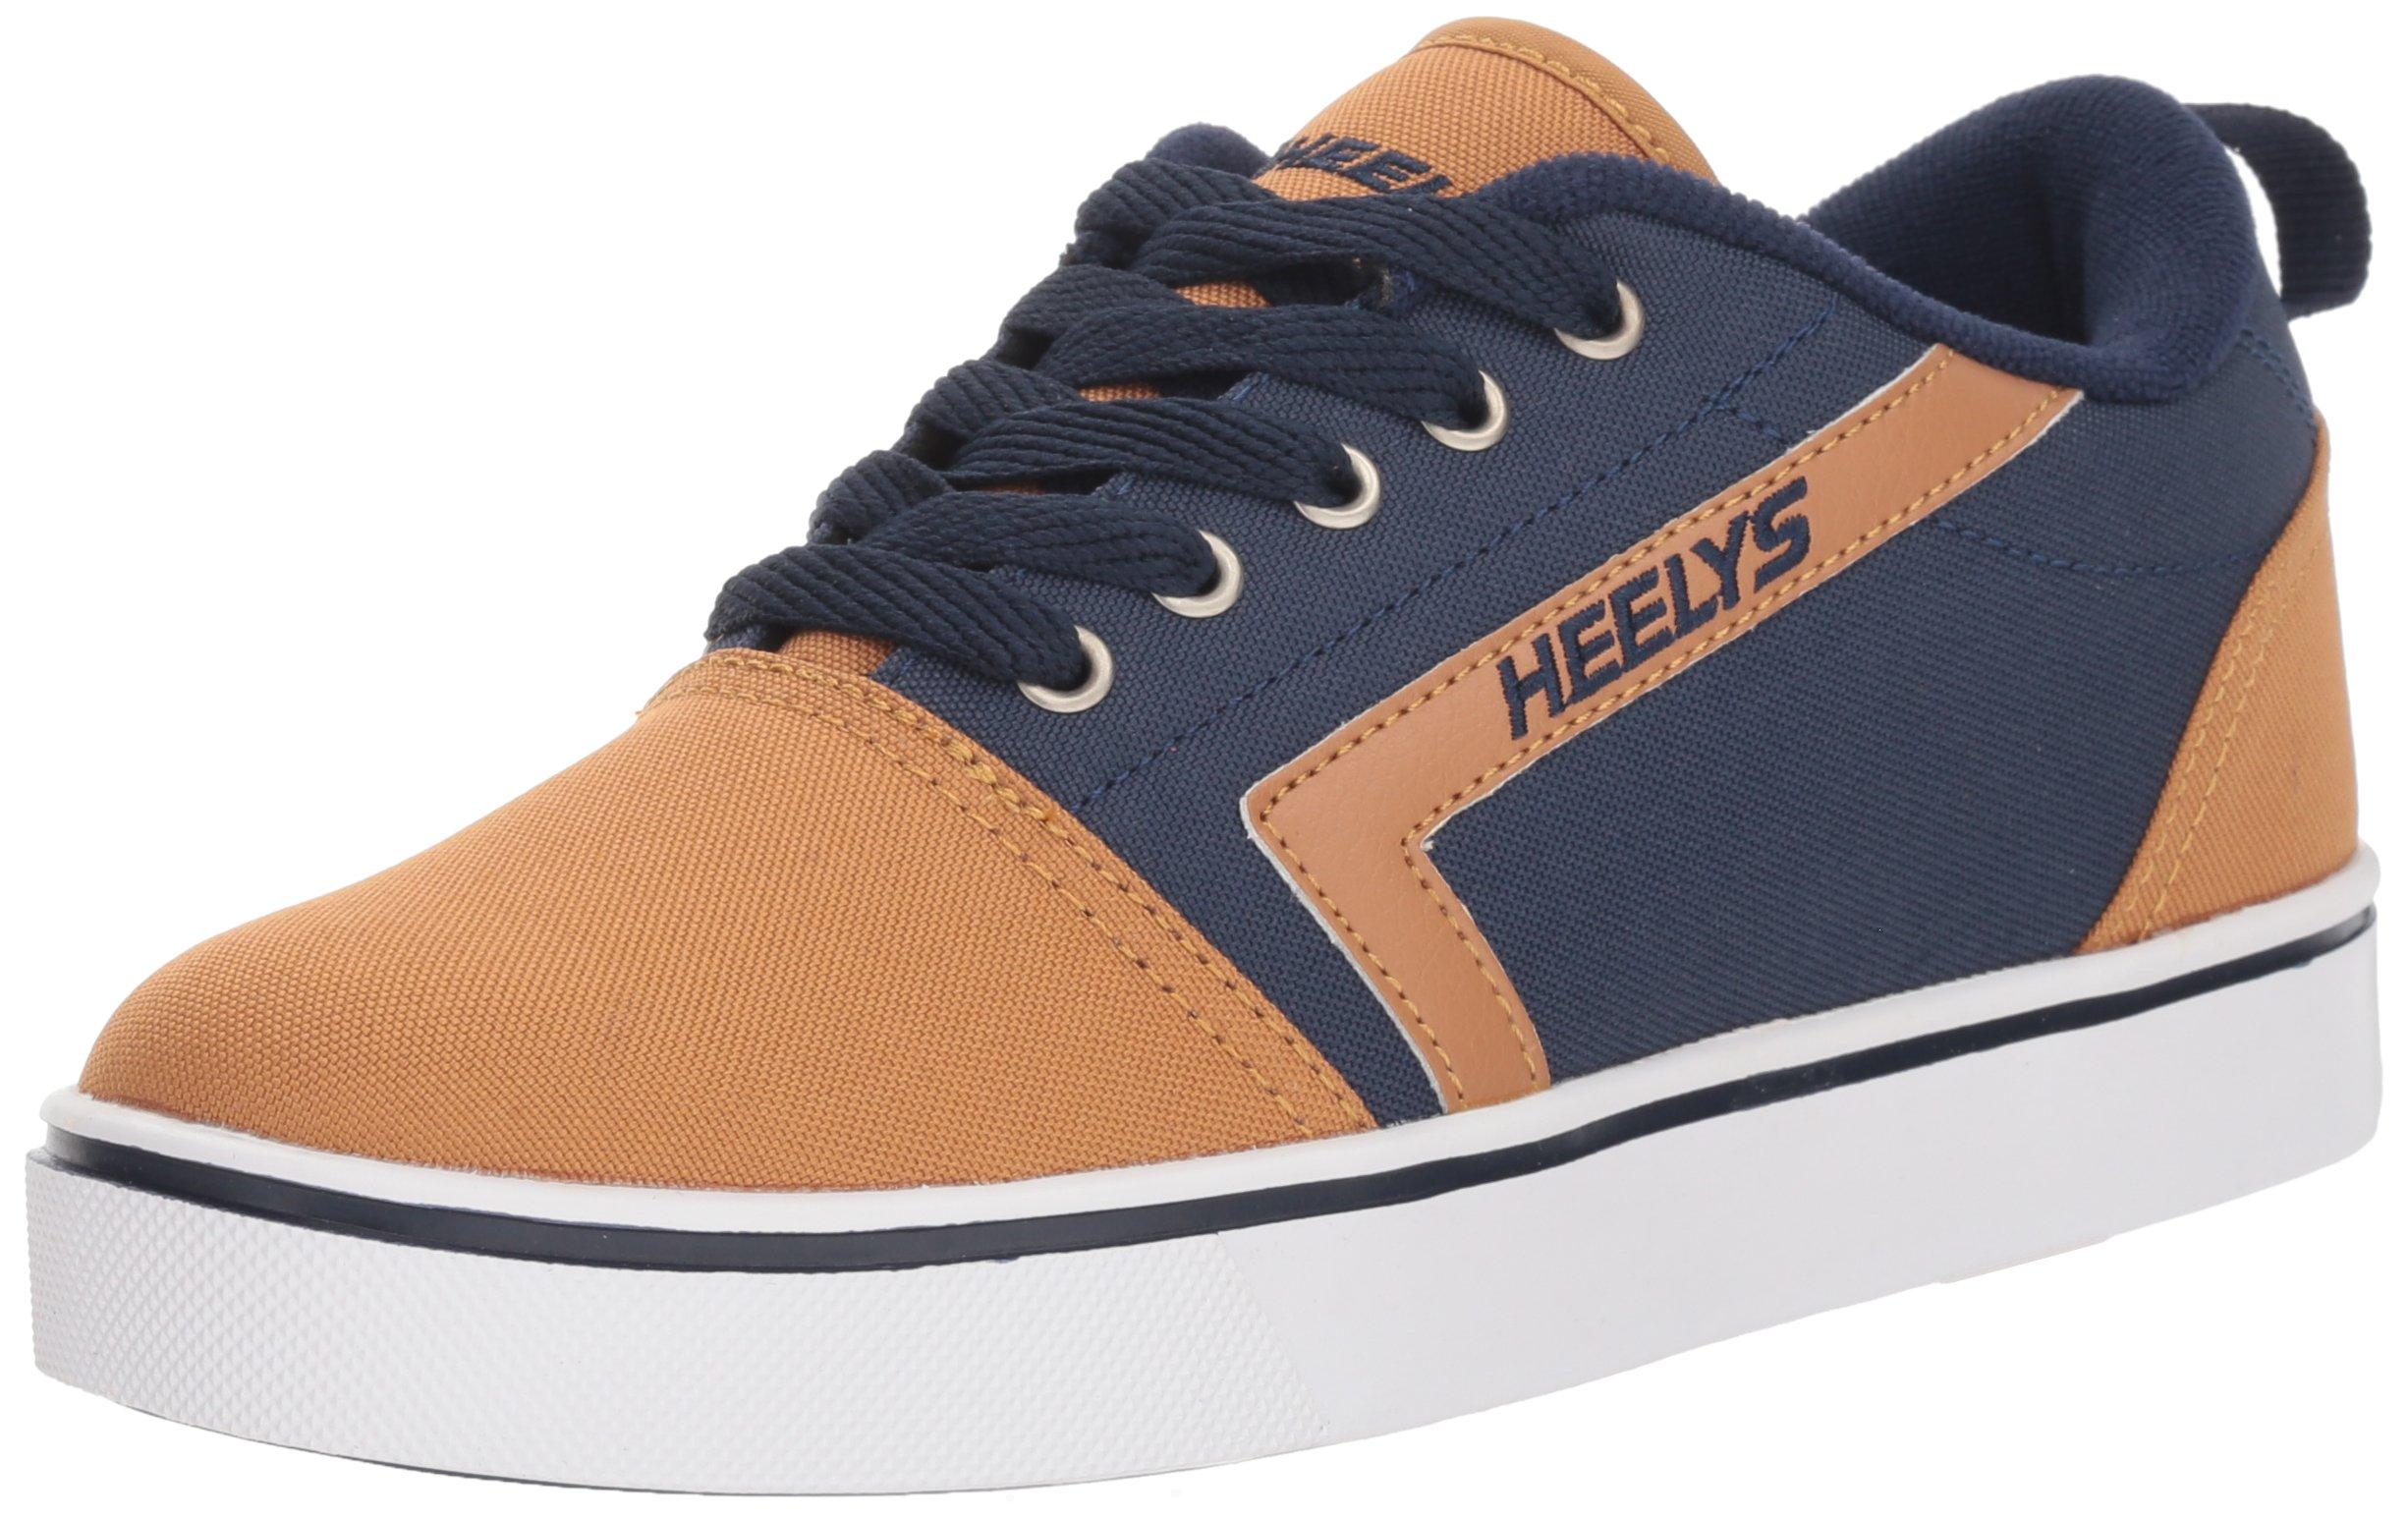 Heelys Boys' GR8 Pro Tennis Shoe Navy/Cashew 1 Medium US Big Kid